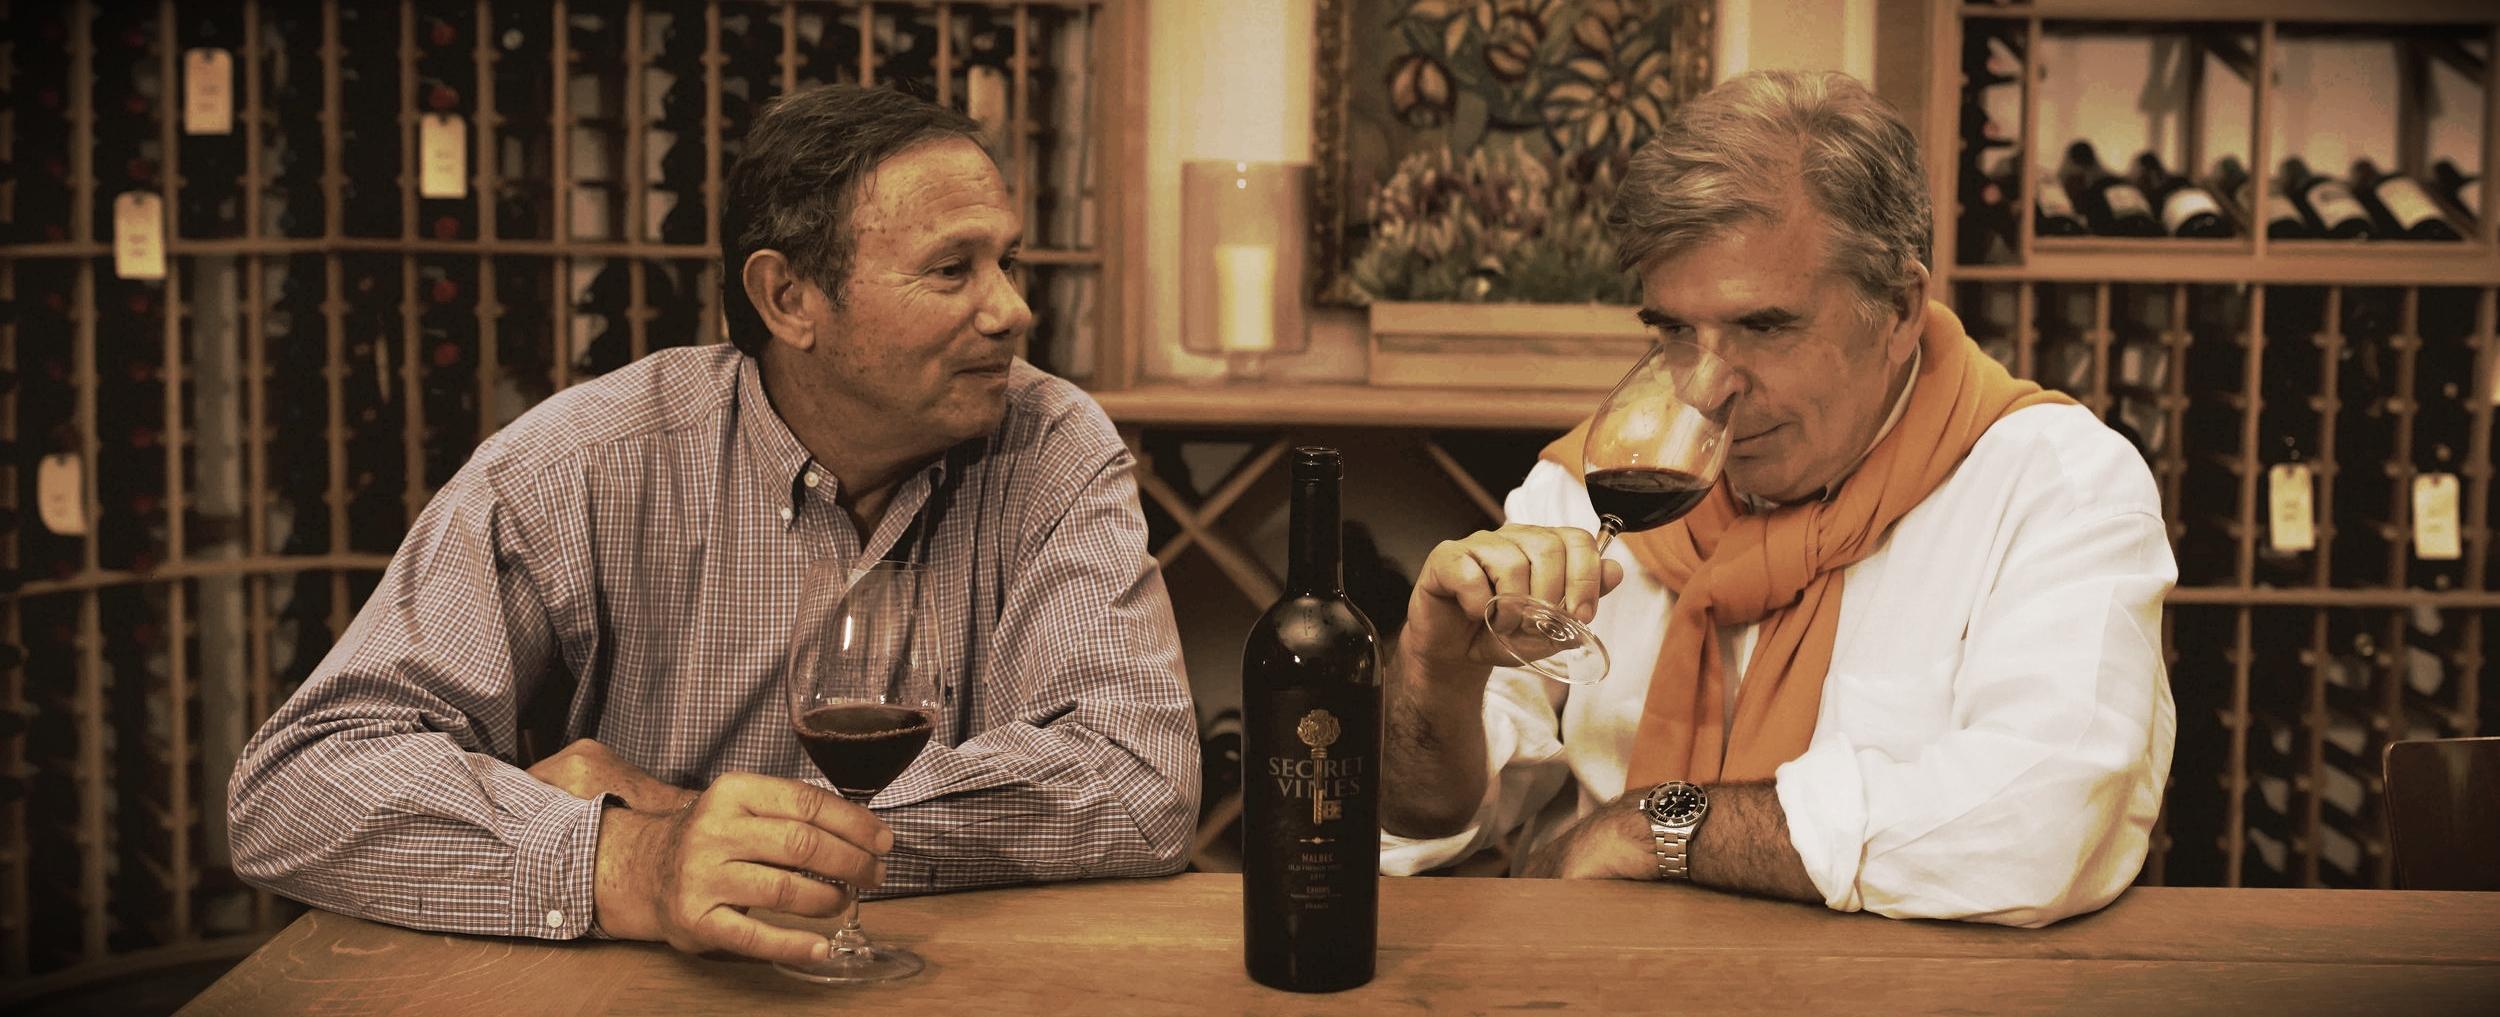 Secret Vines Wine Lifestyle Photography Miami Product Photographer Proofs-63.jpg